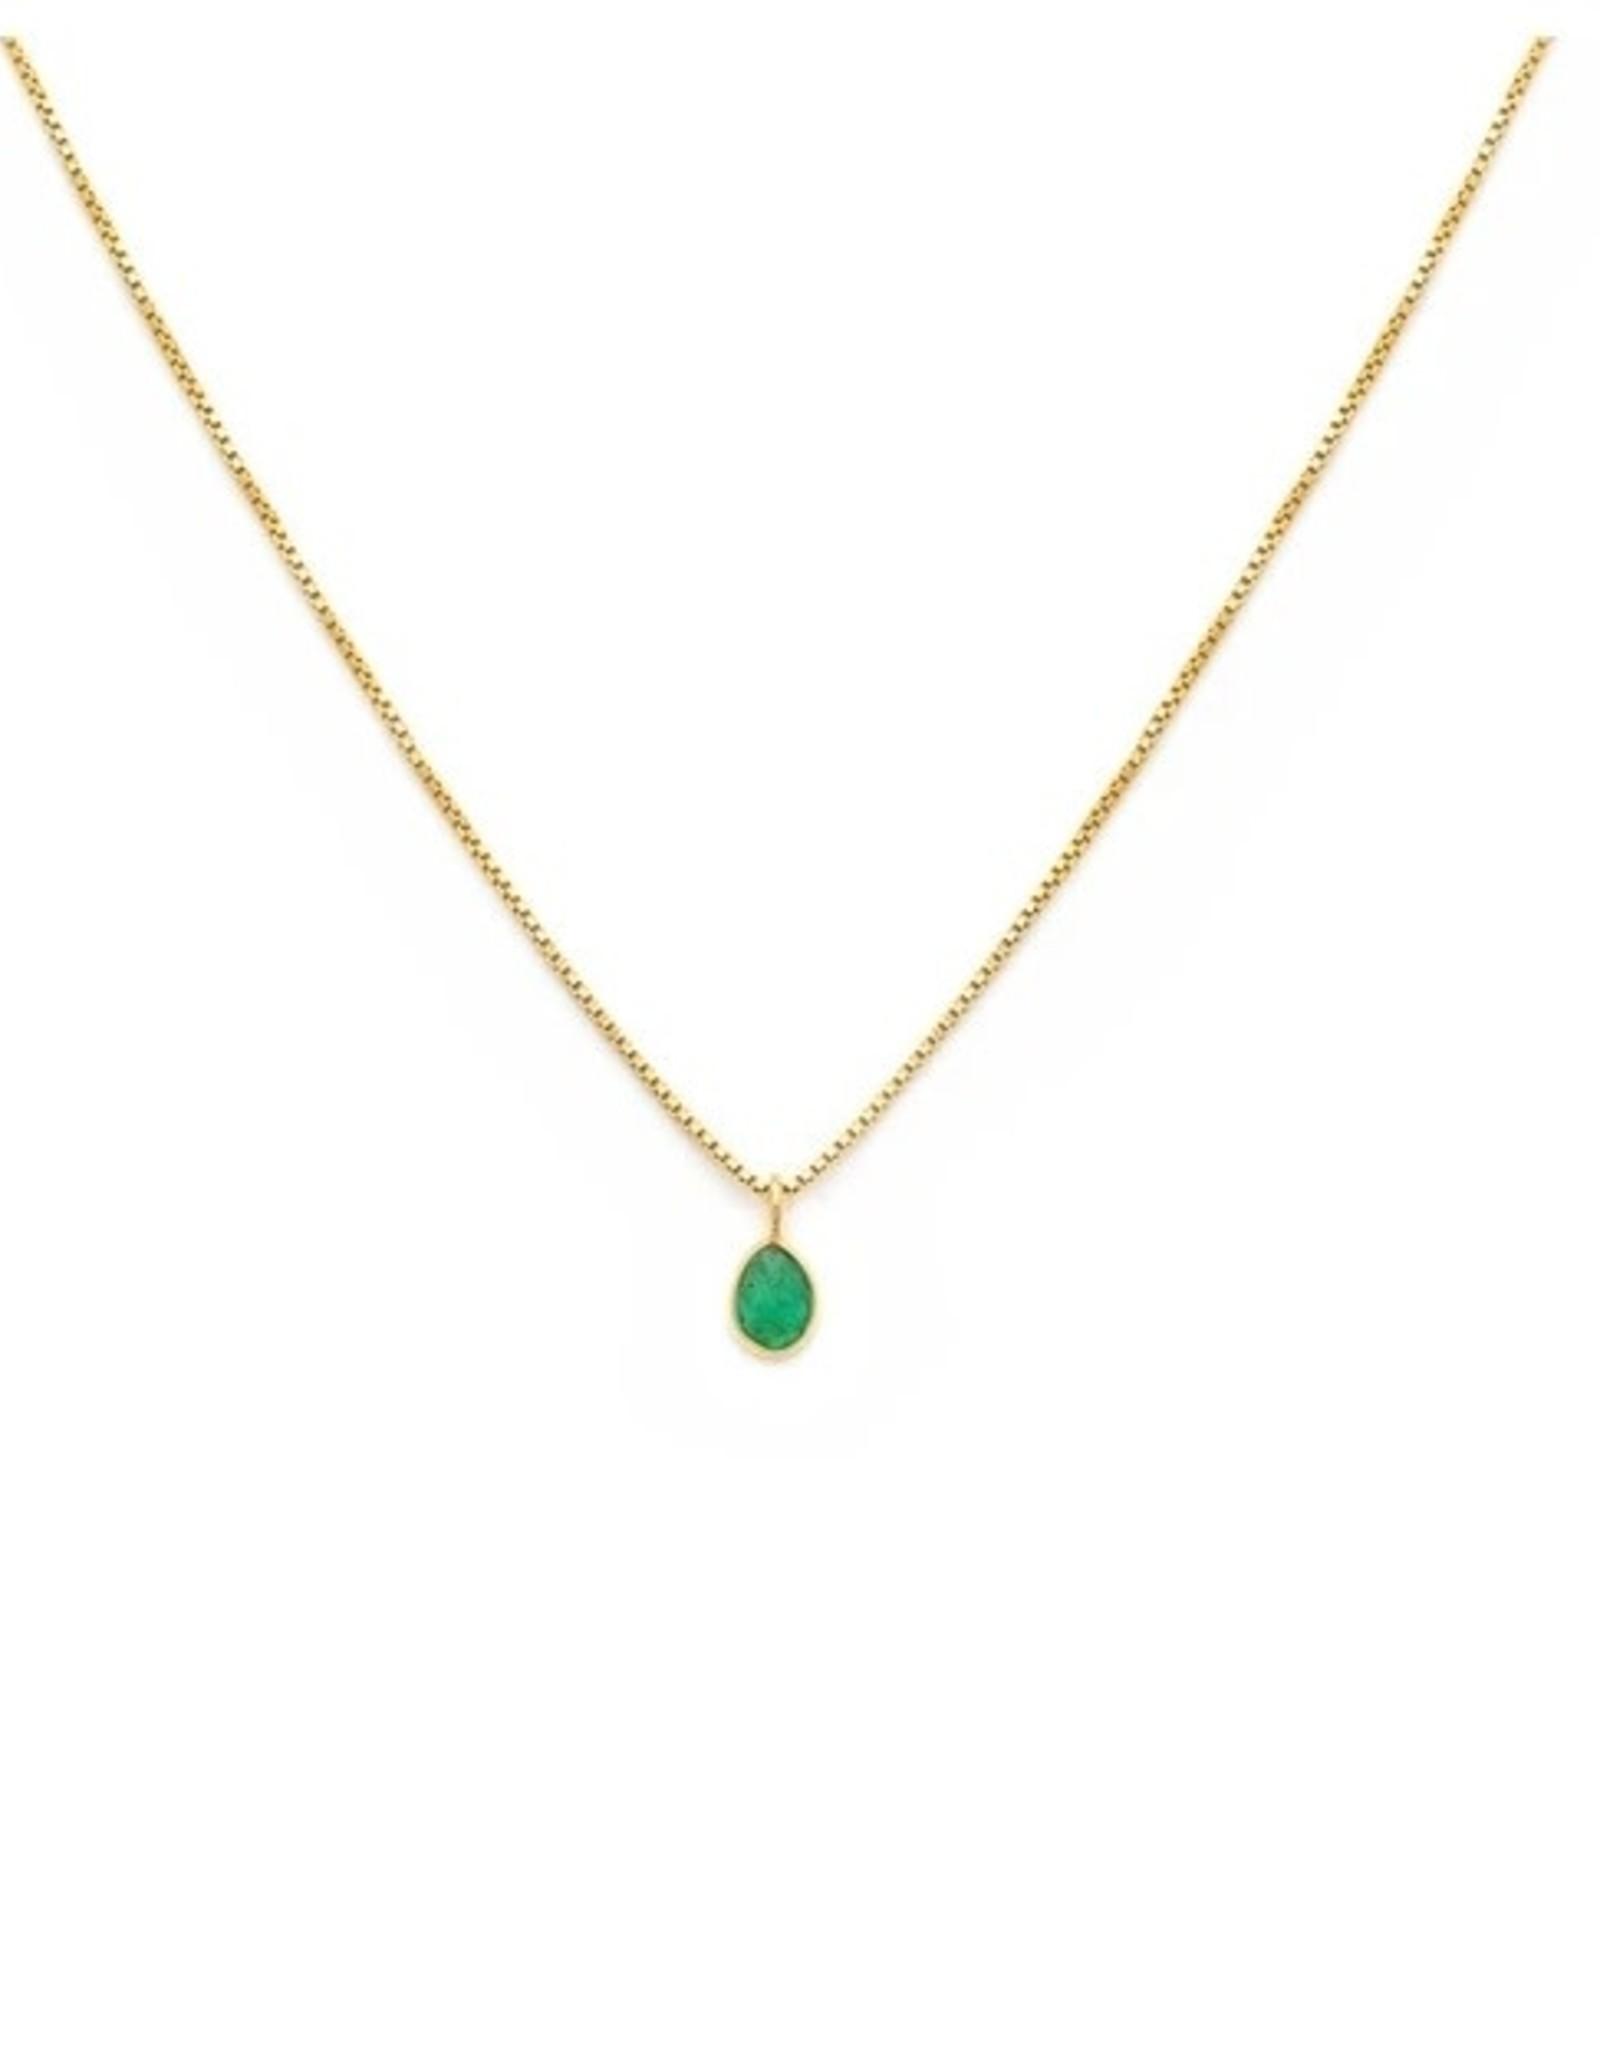 LEAH ALEXANDRA Sofia Slice Necklace, Emerald 14k Gold